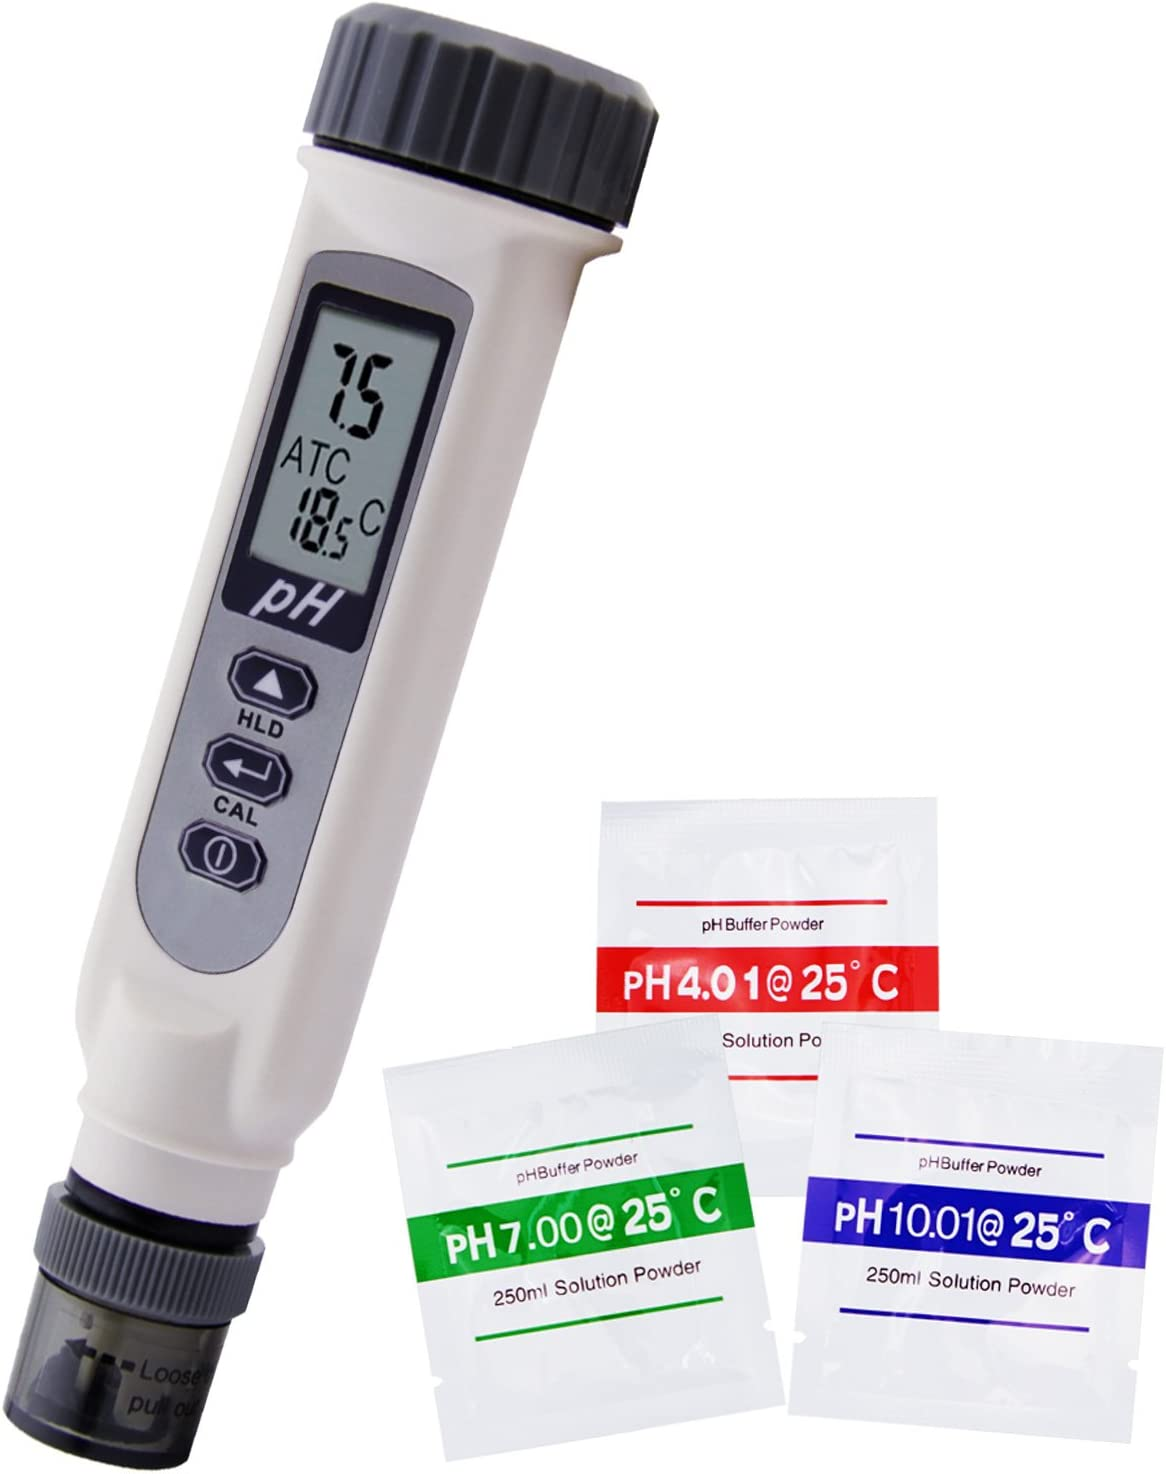 TEKCOPLUS Waterproof 0~14 Digital pH Meter with Temperature Measurement High Accuracy pH Pen Tests Water, Aquarium, Pool, Hydroponics